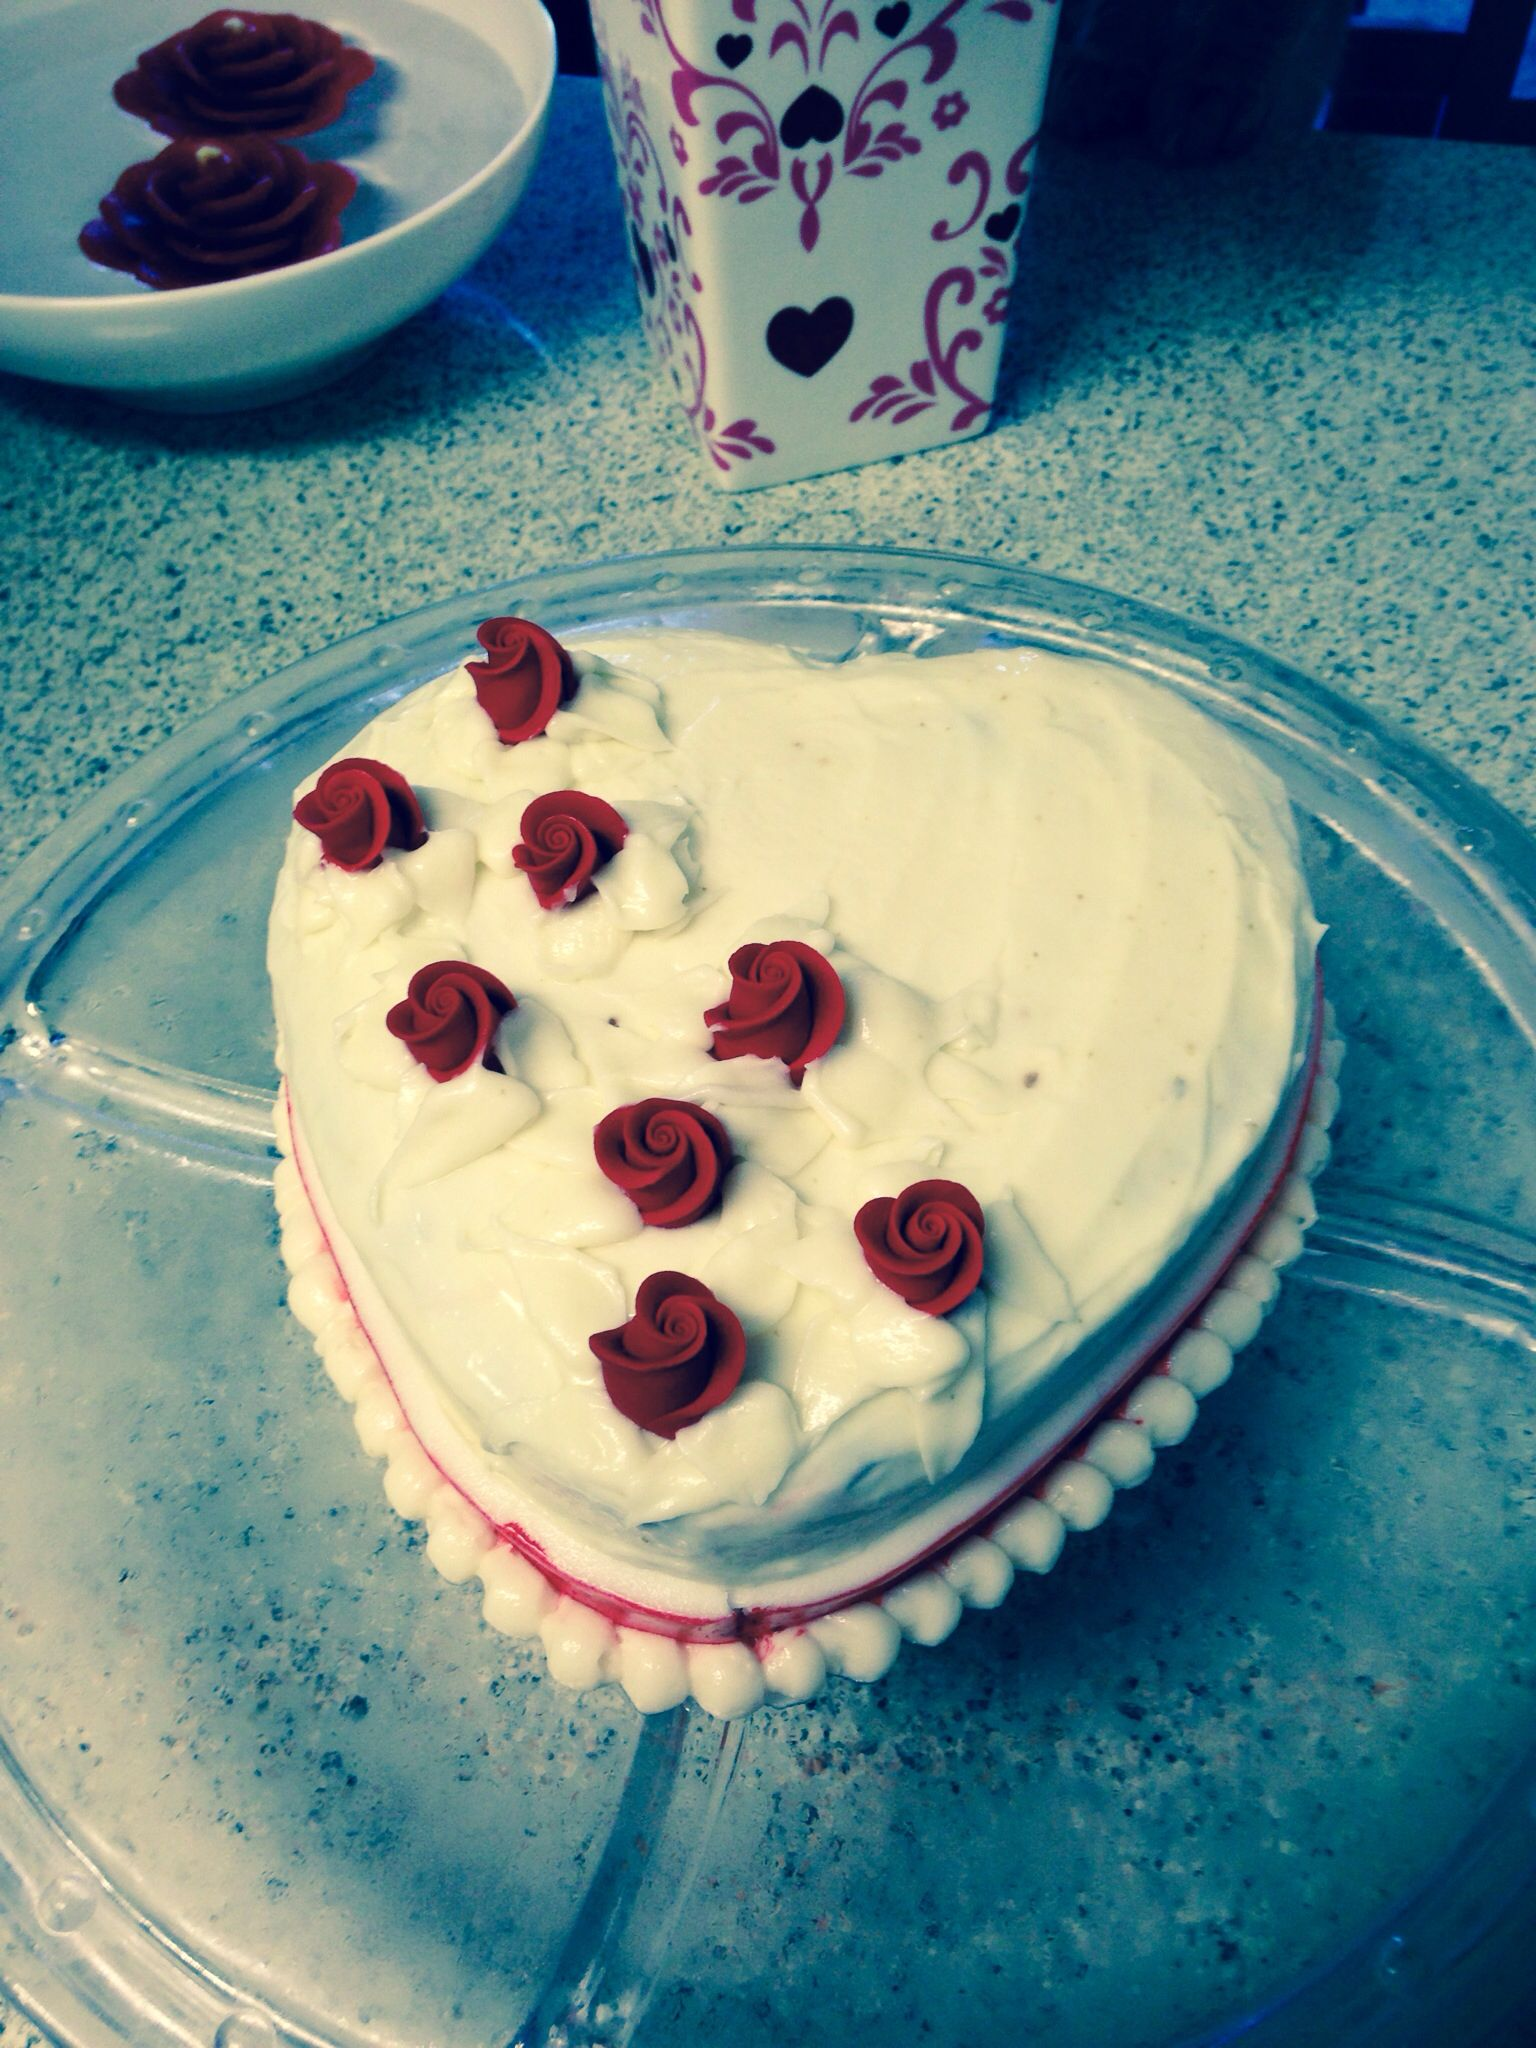 Valentines cake I made